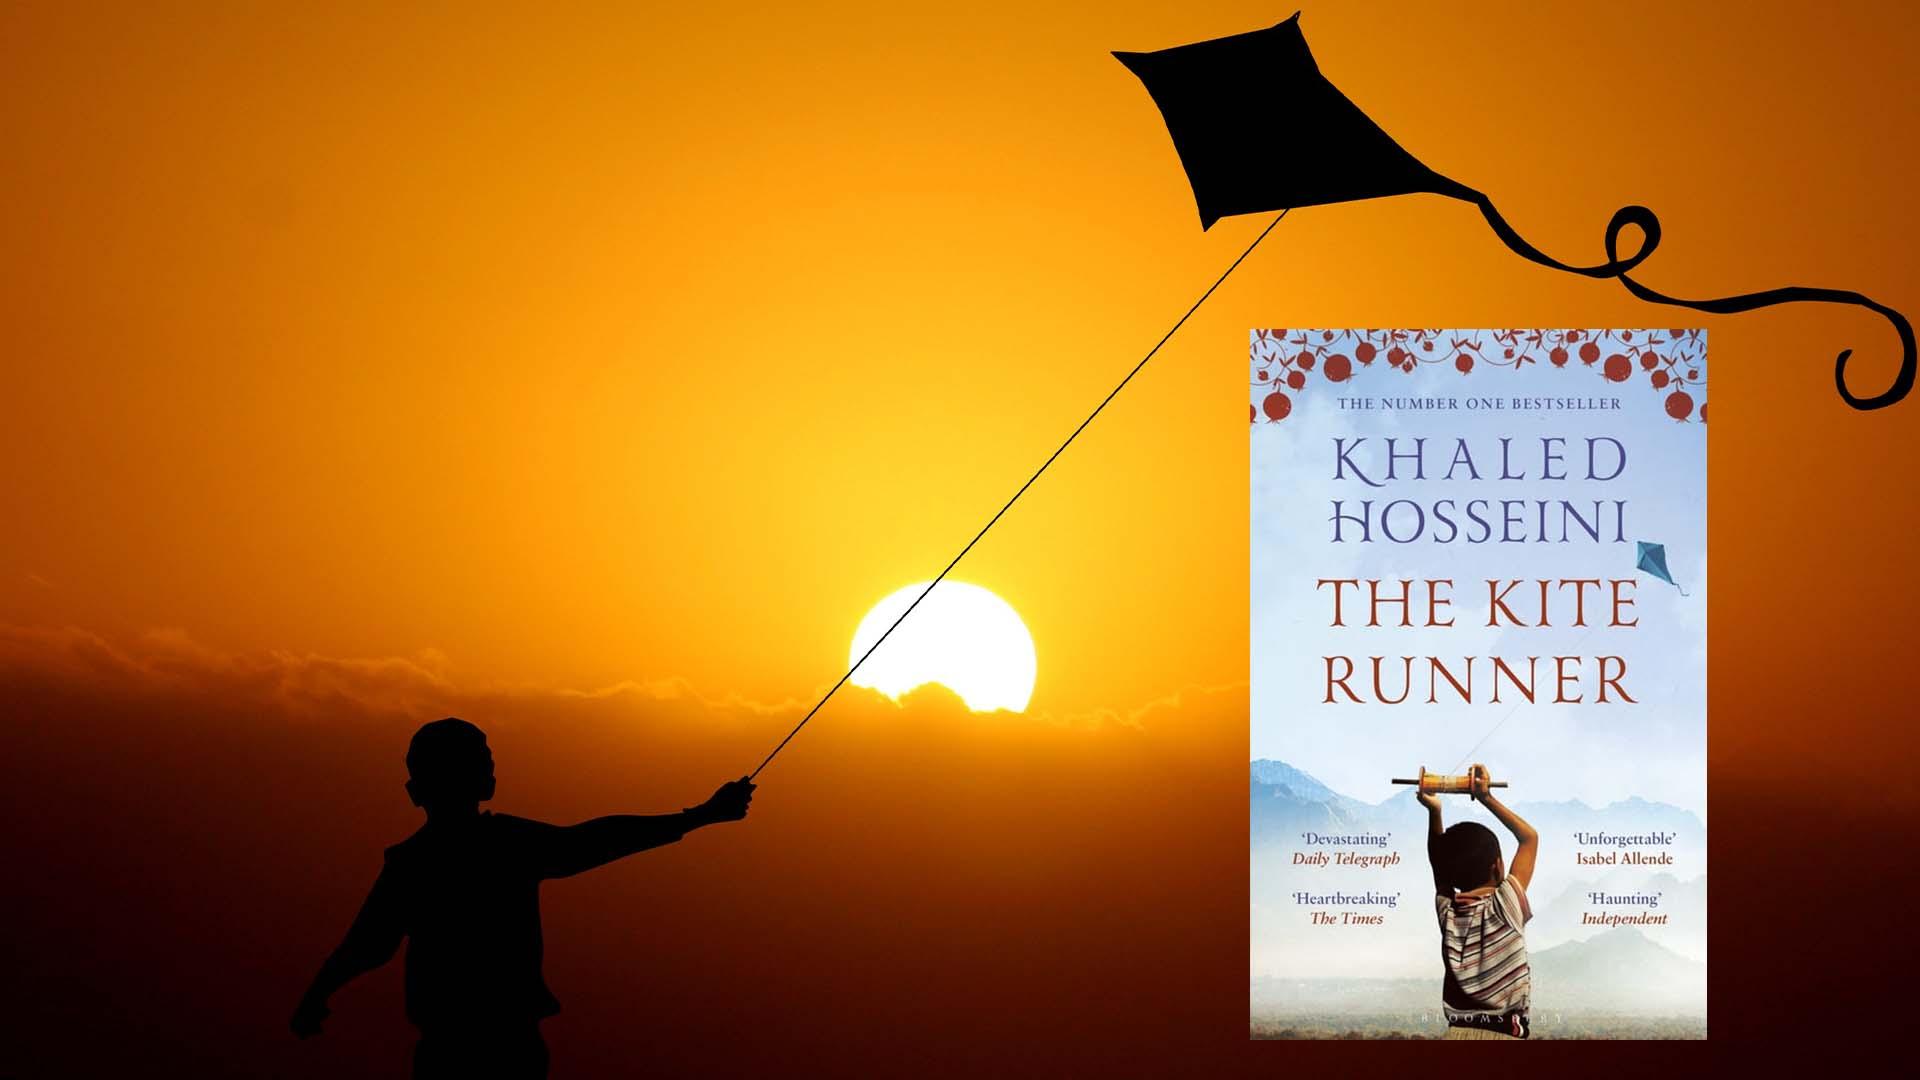 Khaled Hosseini - Famous books